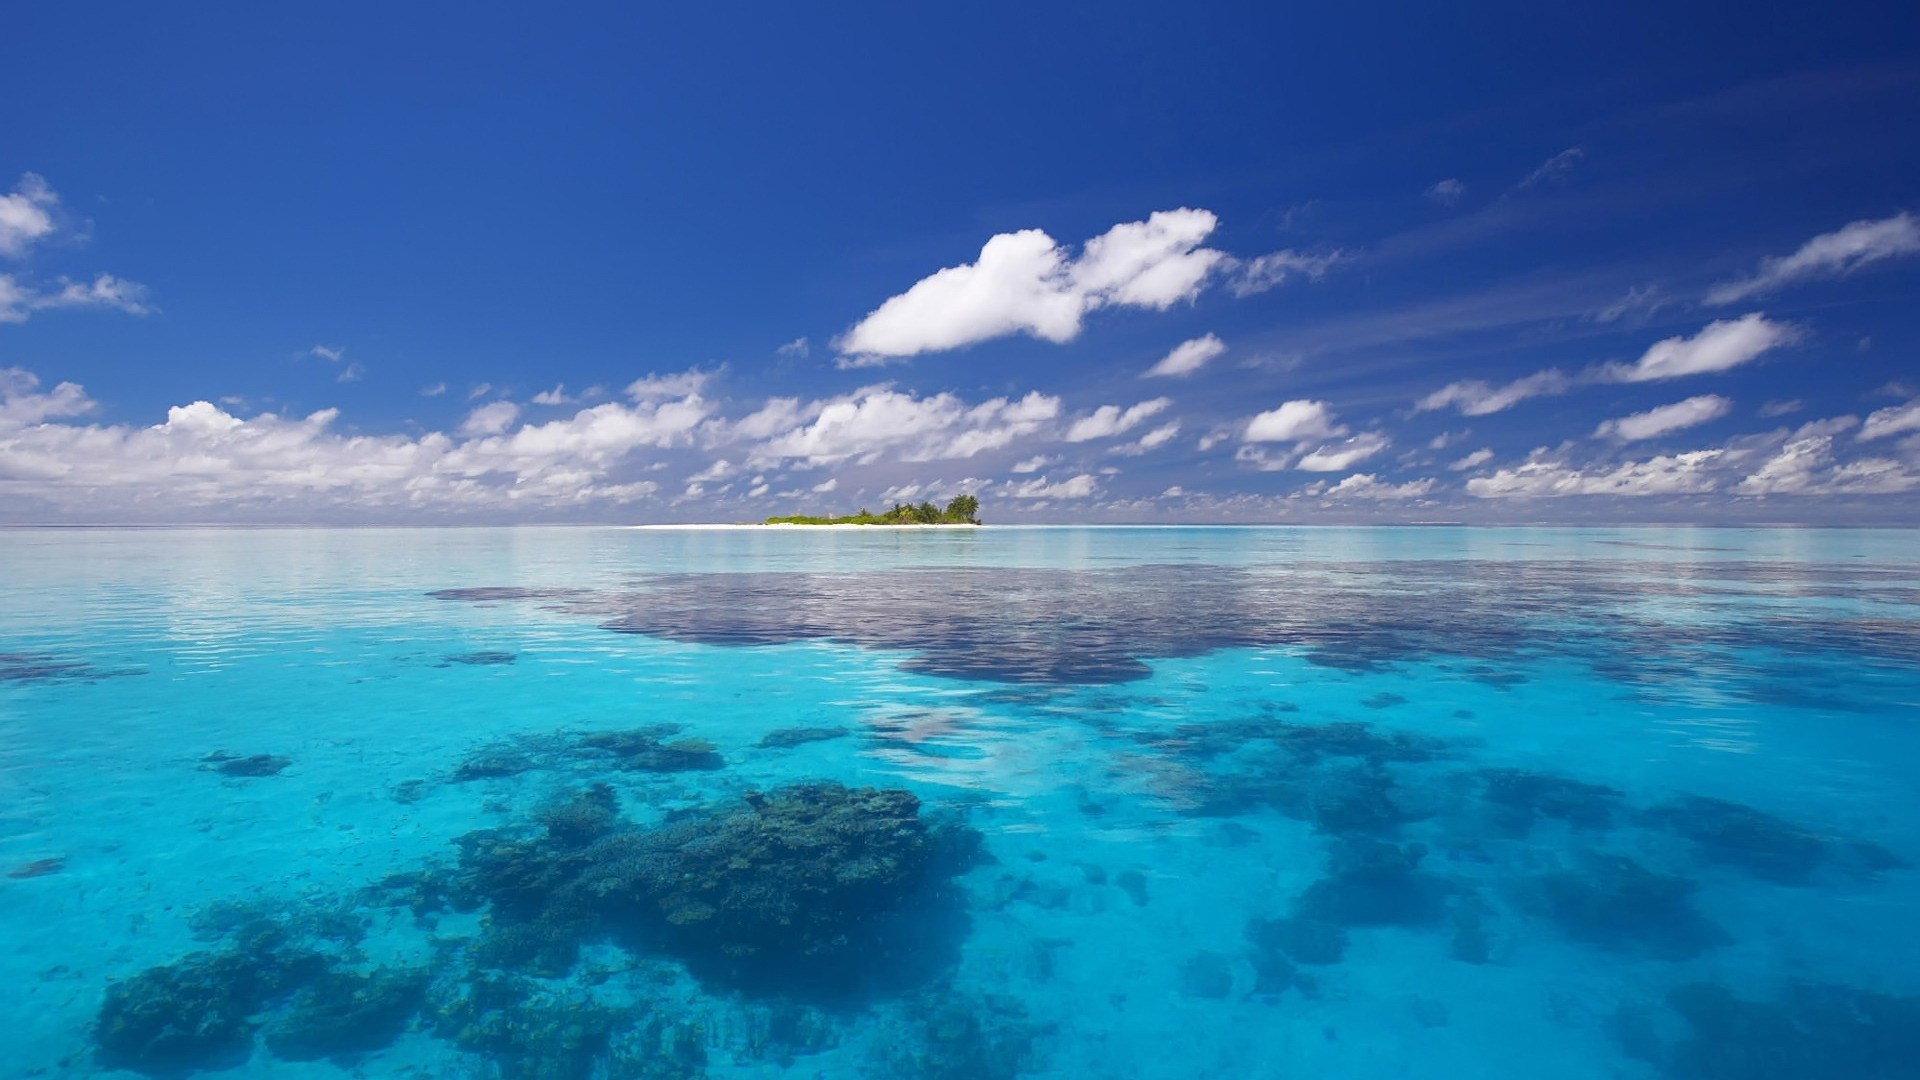 Ocean, Landscape, Desktop, Wallpaper, Free, Download, Wide, Cool,